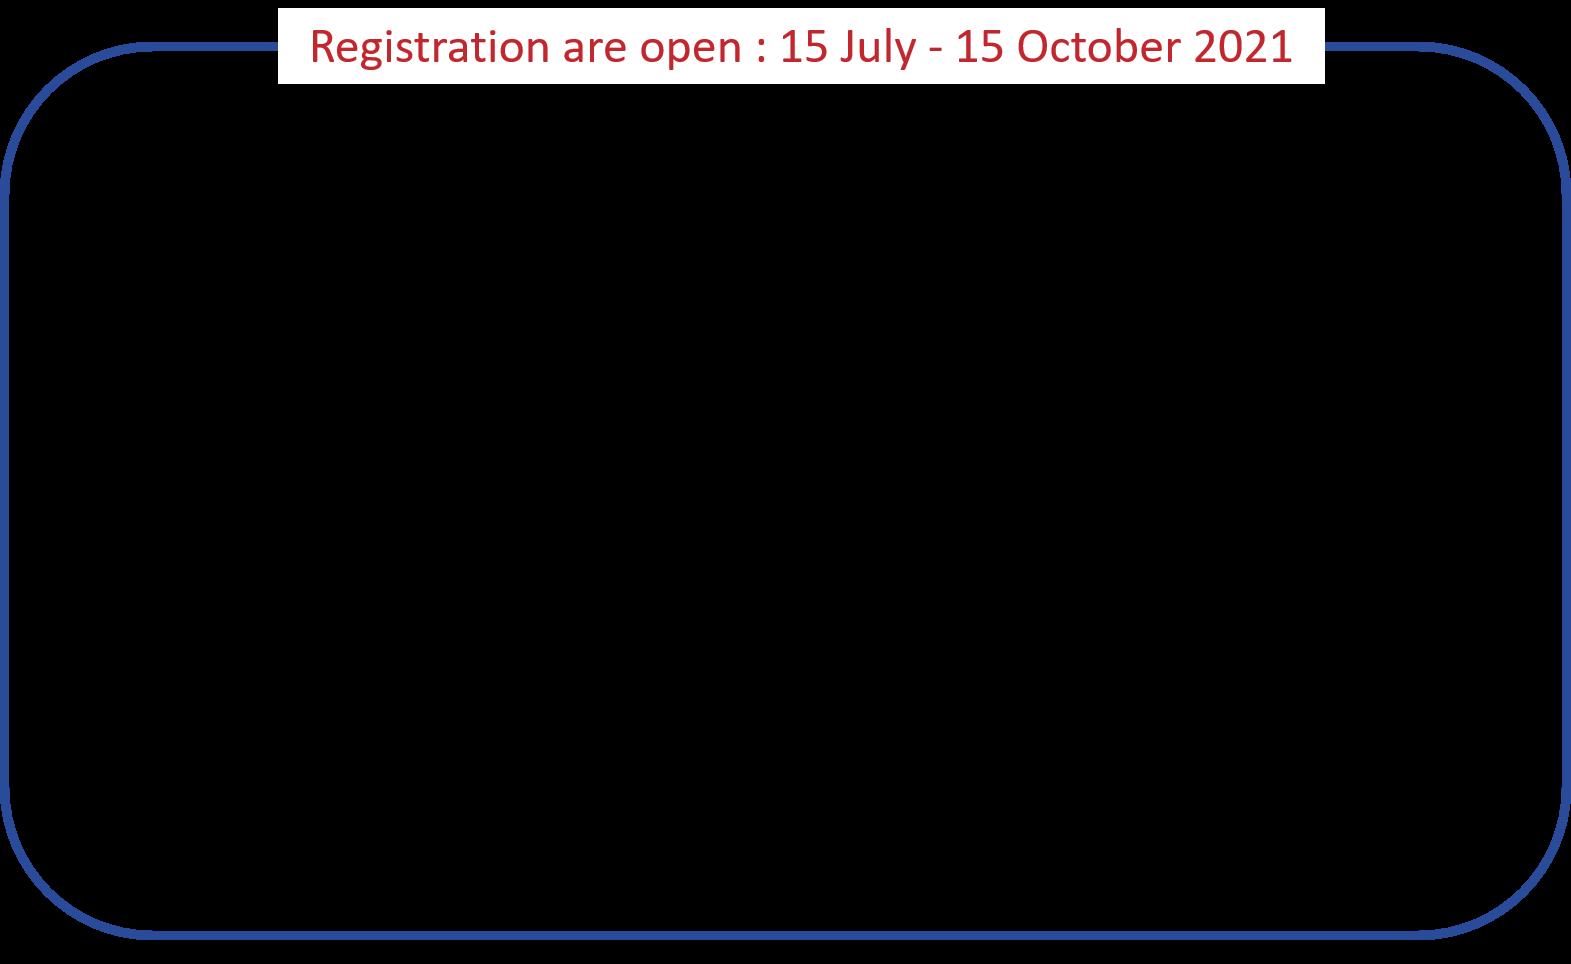 EditoRegistration